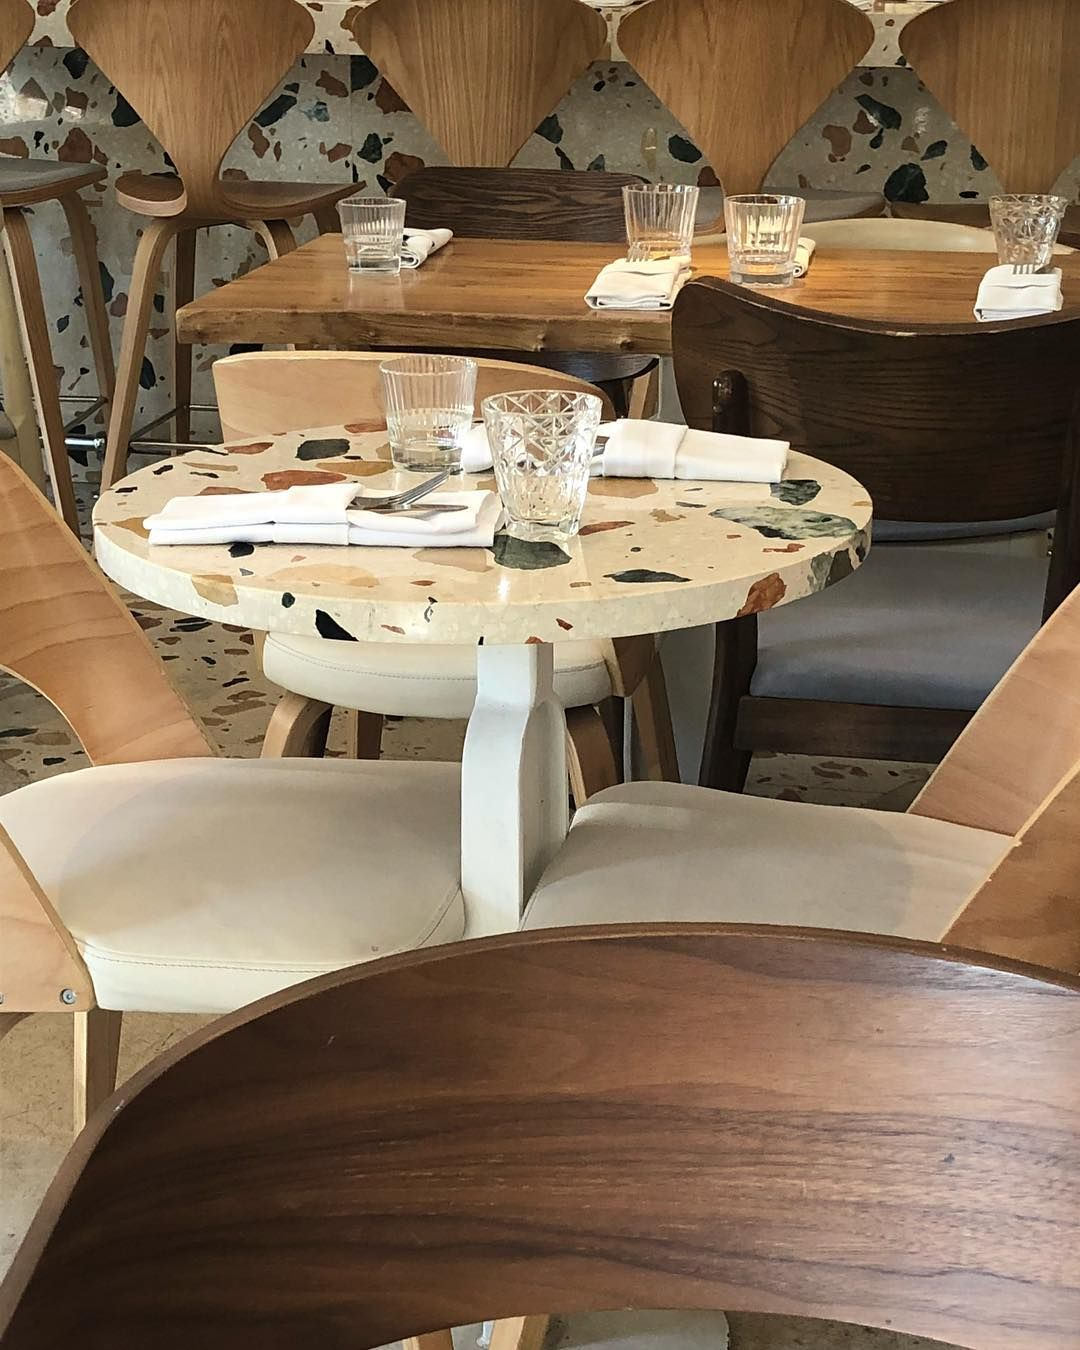 Terrazzo Tabletop In Moscow Restuarant #terrazzo